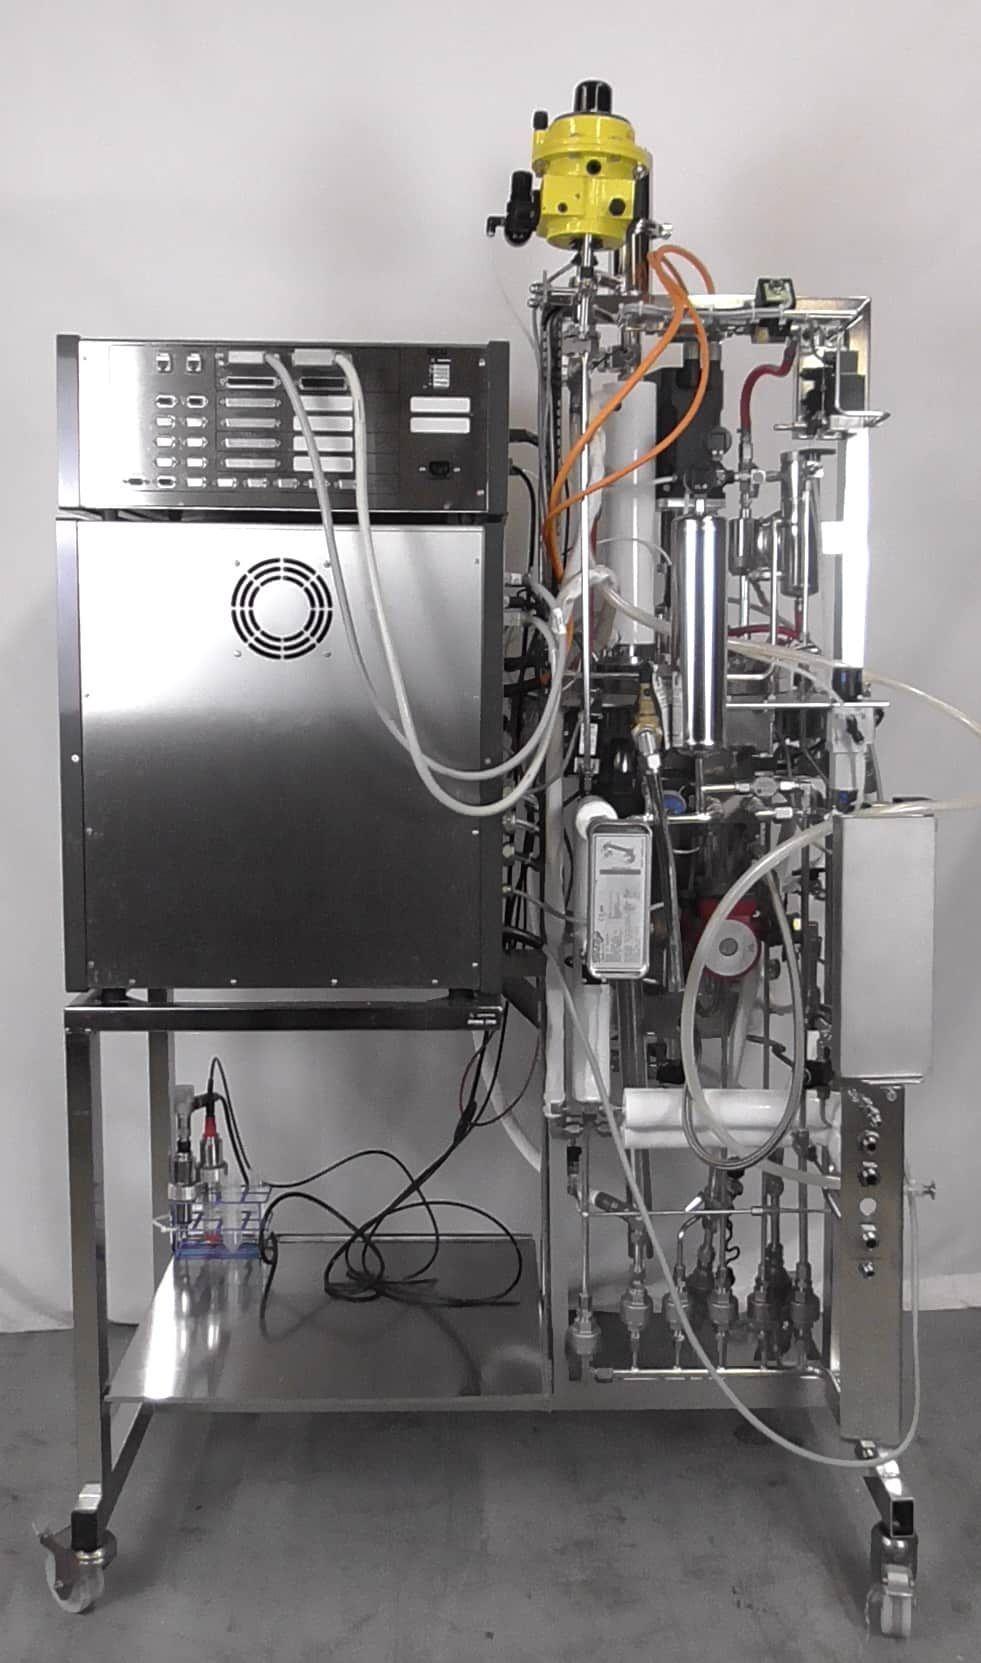 Sartorius Biostat C-DCU3 Bioreactor